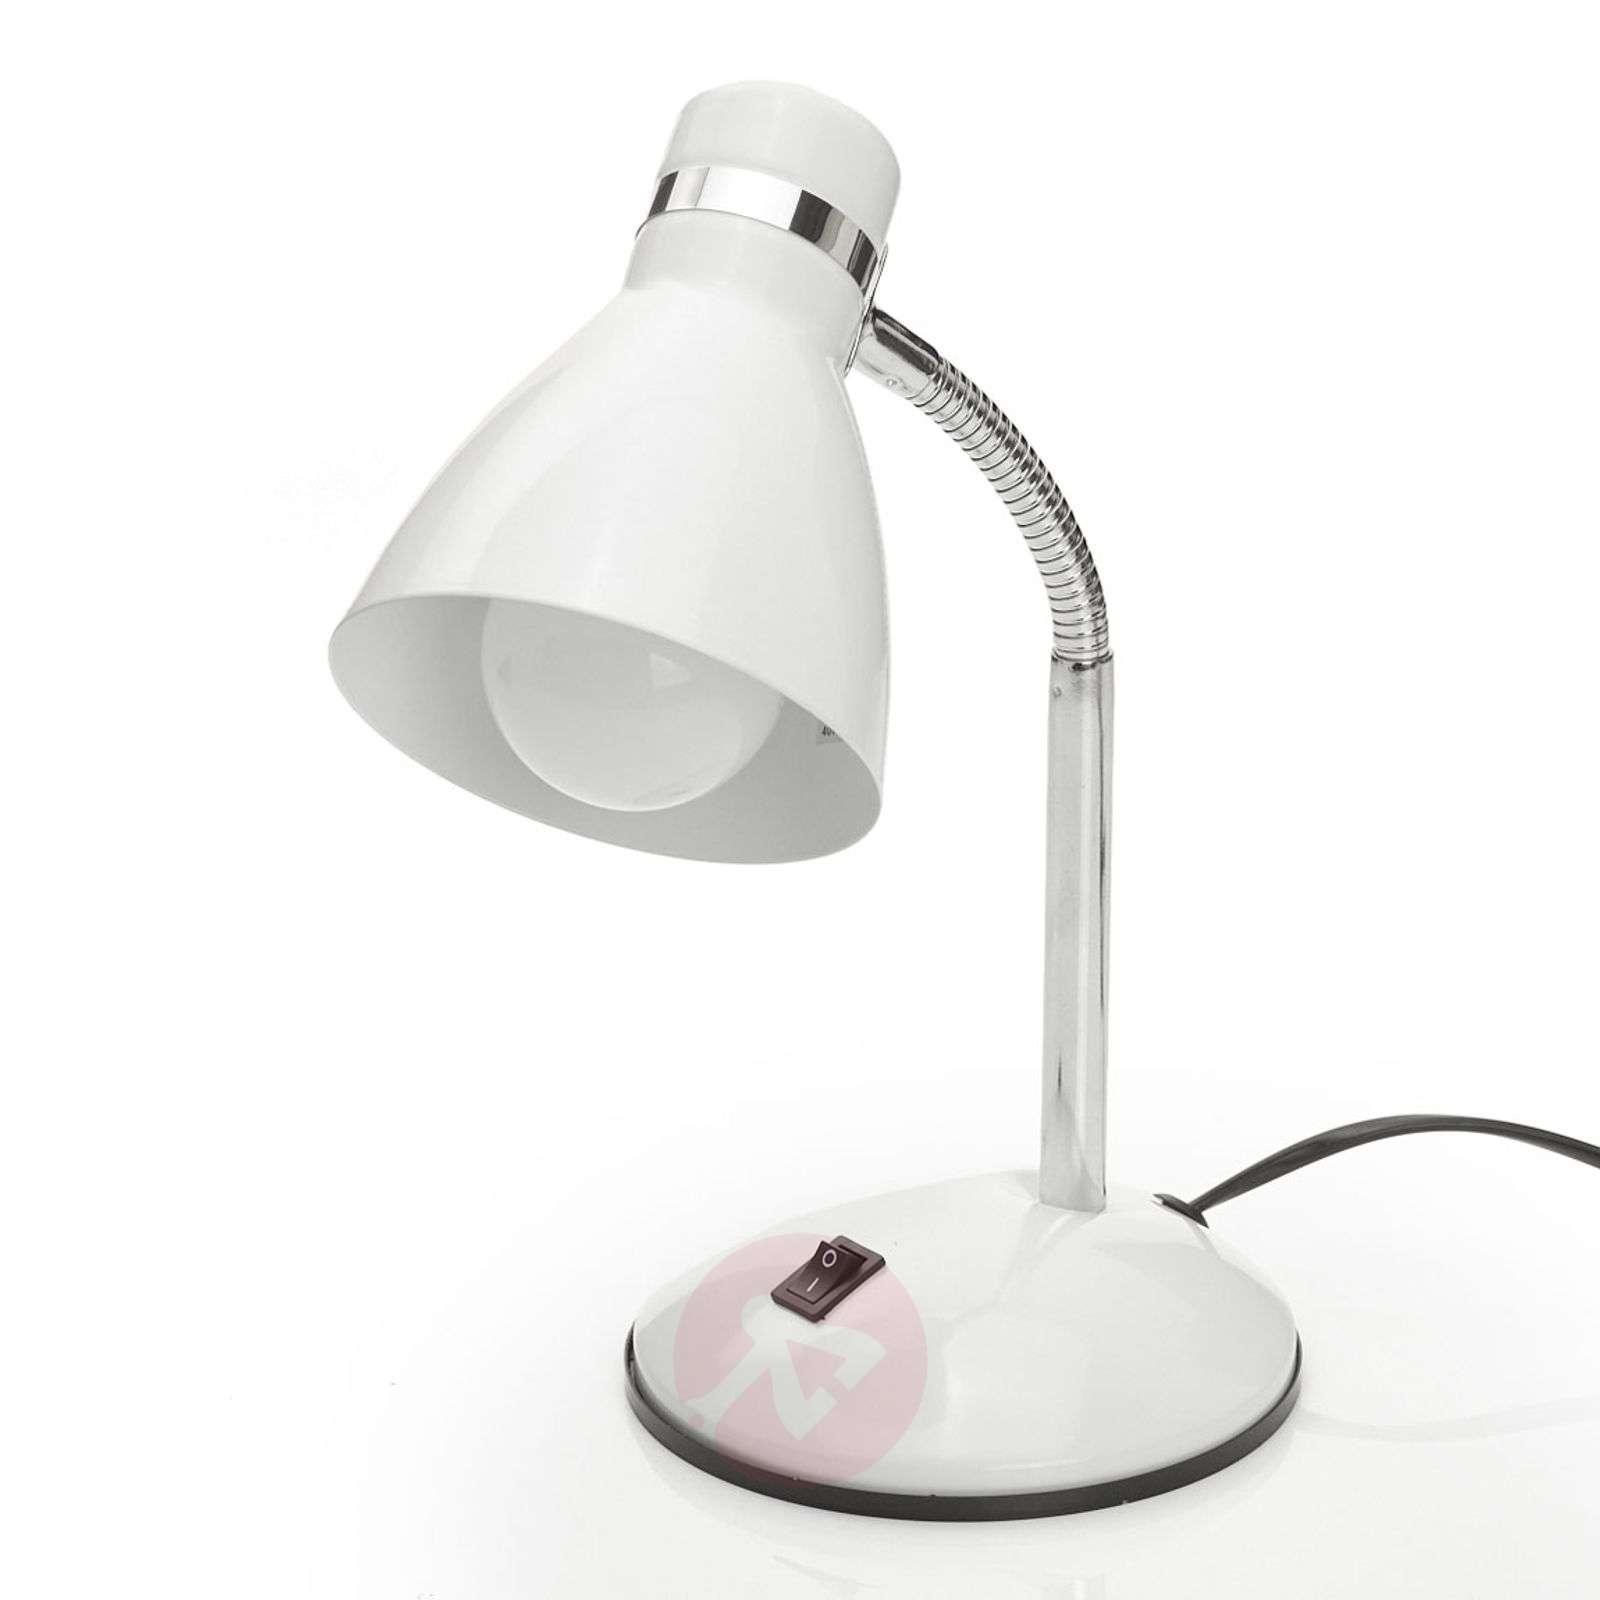 White desk lamp Studio-3004197-01